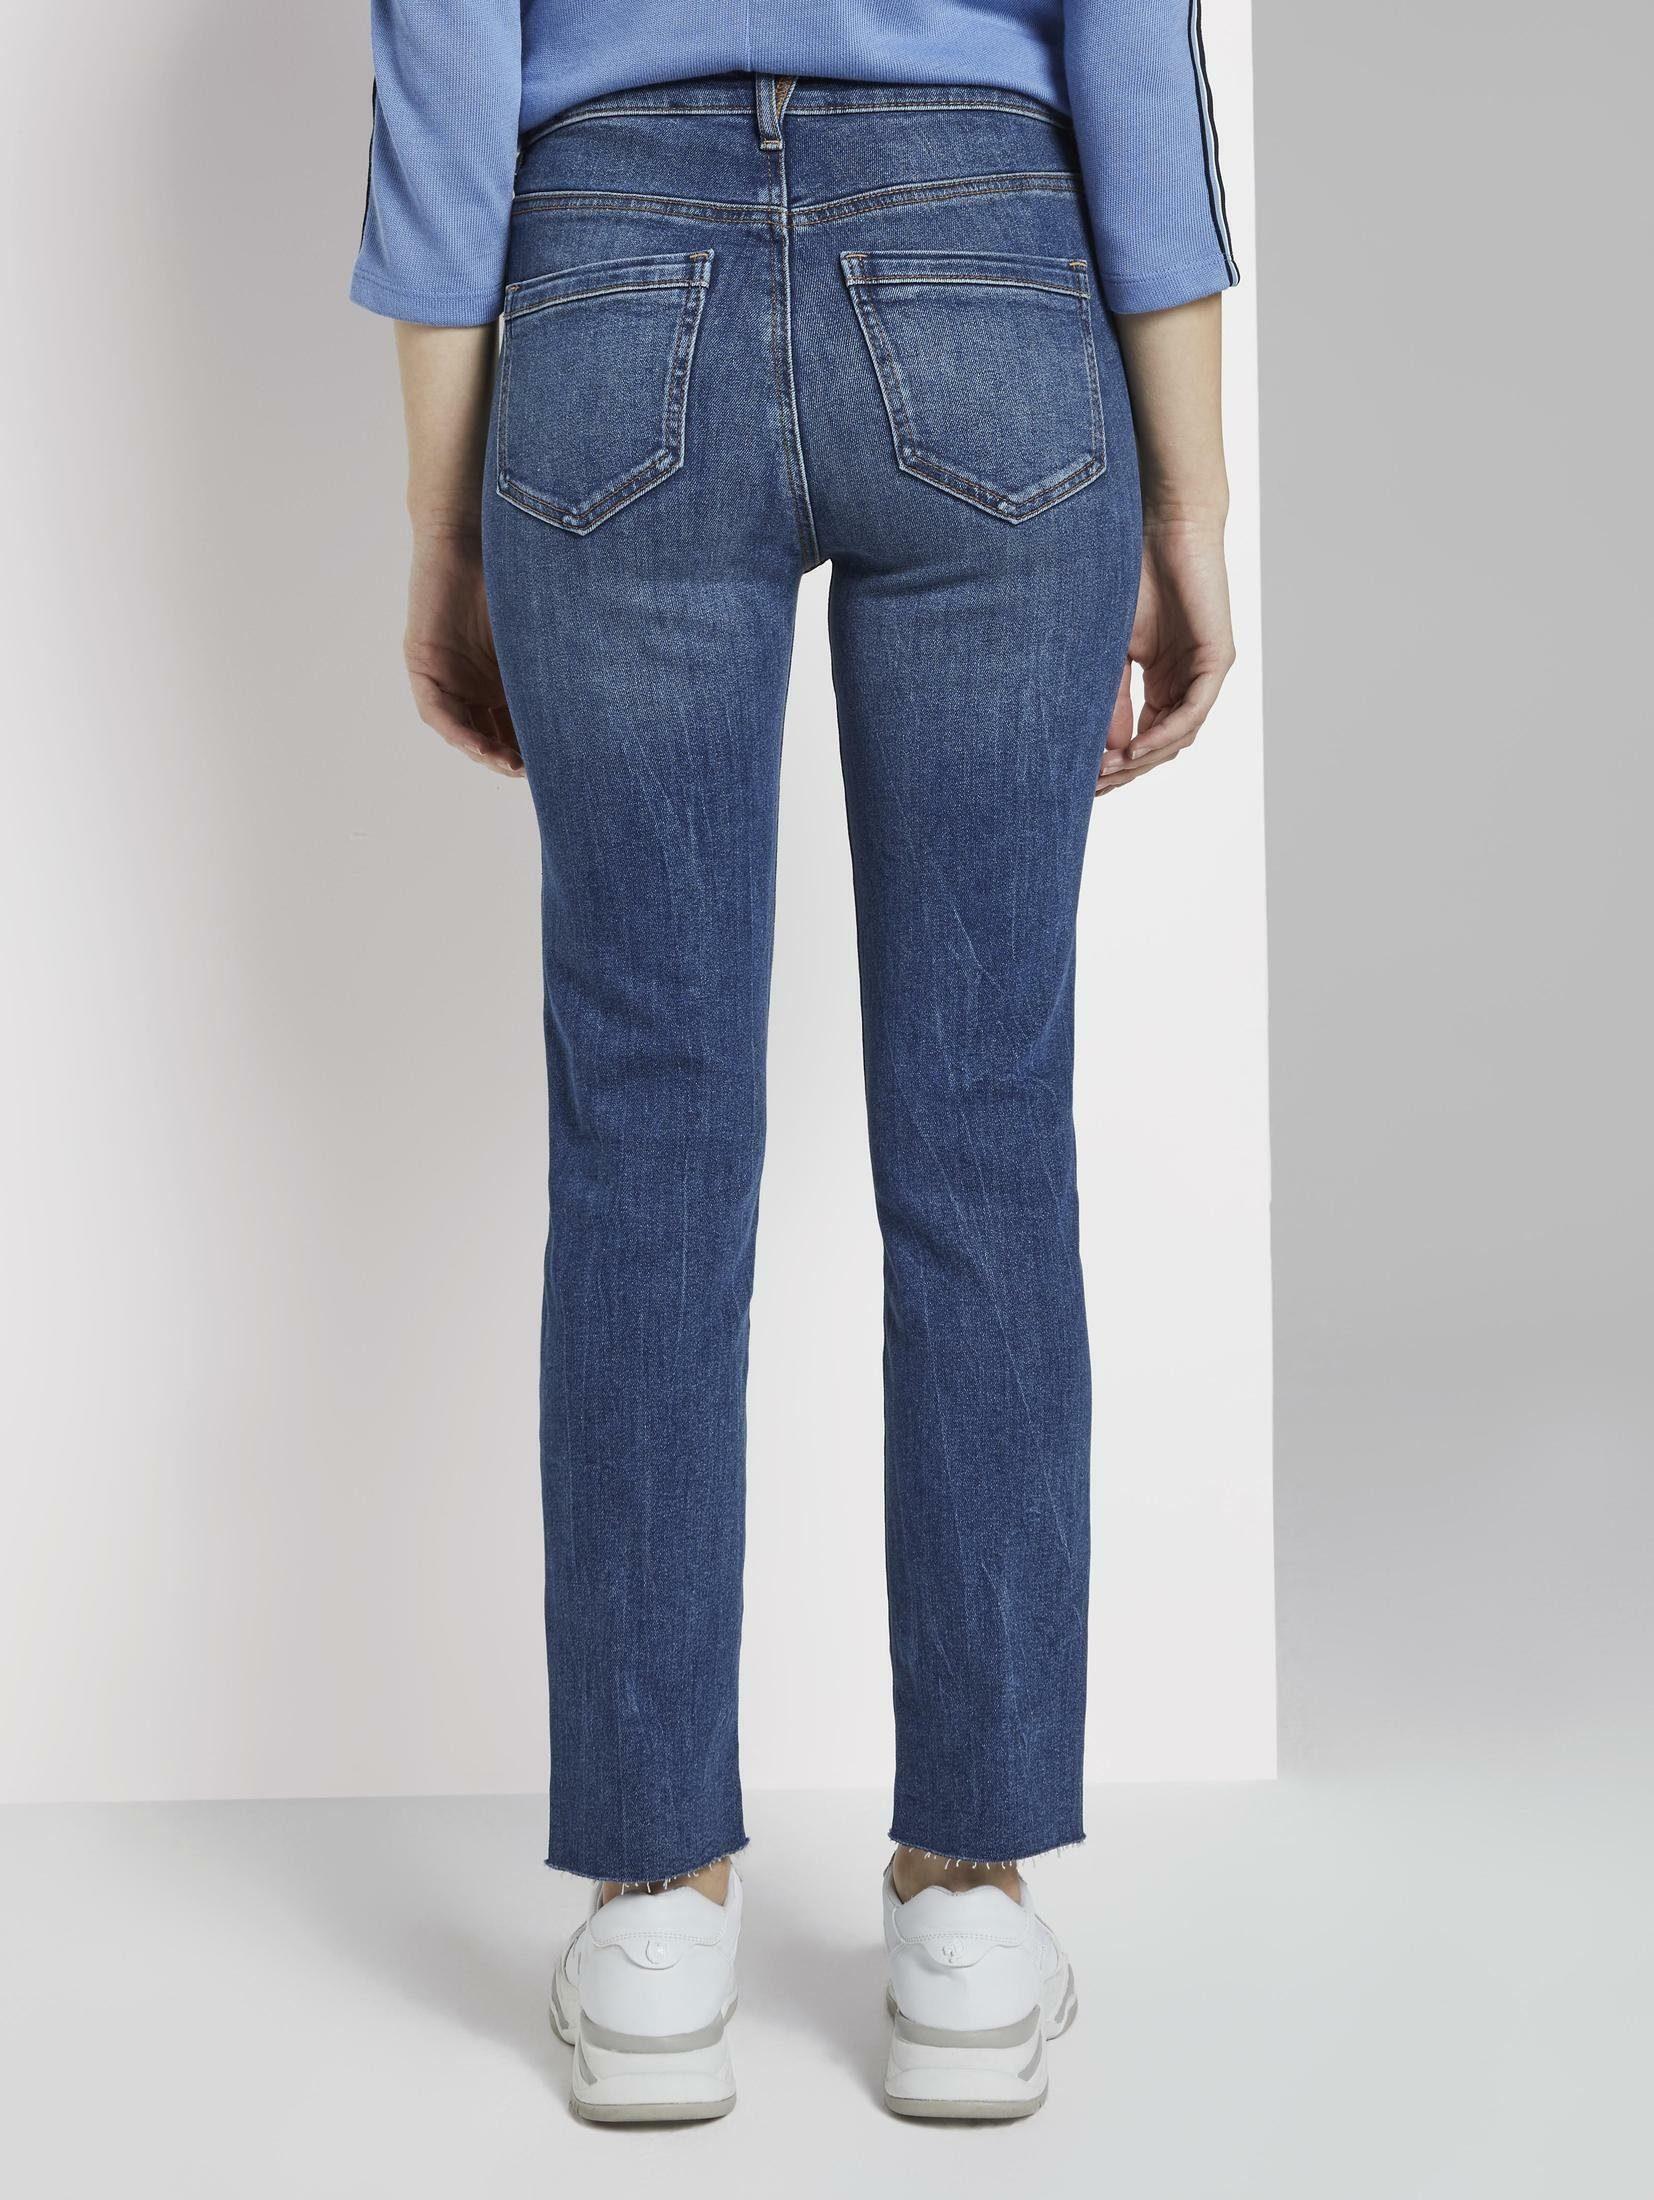 TOM TAILOR Slim fit Jeans »Kate Slim Jeans« kaufen | OTTO